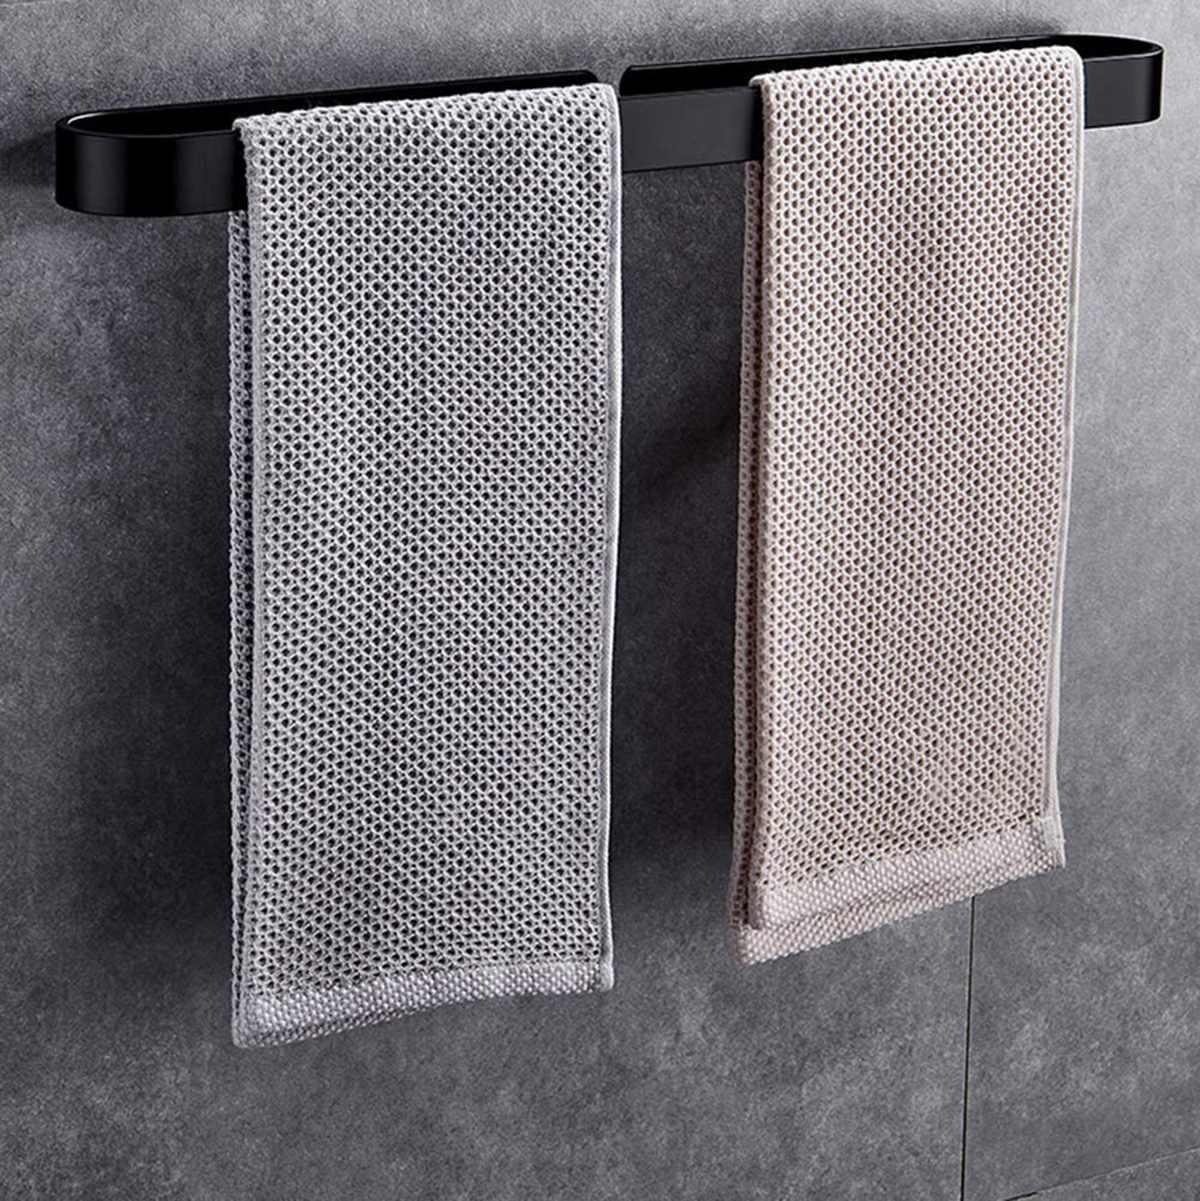 30/50/20CM toallero Blanco/Negro barra única baño colgante toallero barra colgador de toallas accesorios de almacenamiento de baño